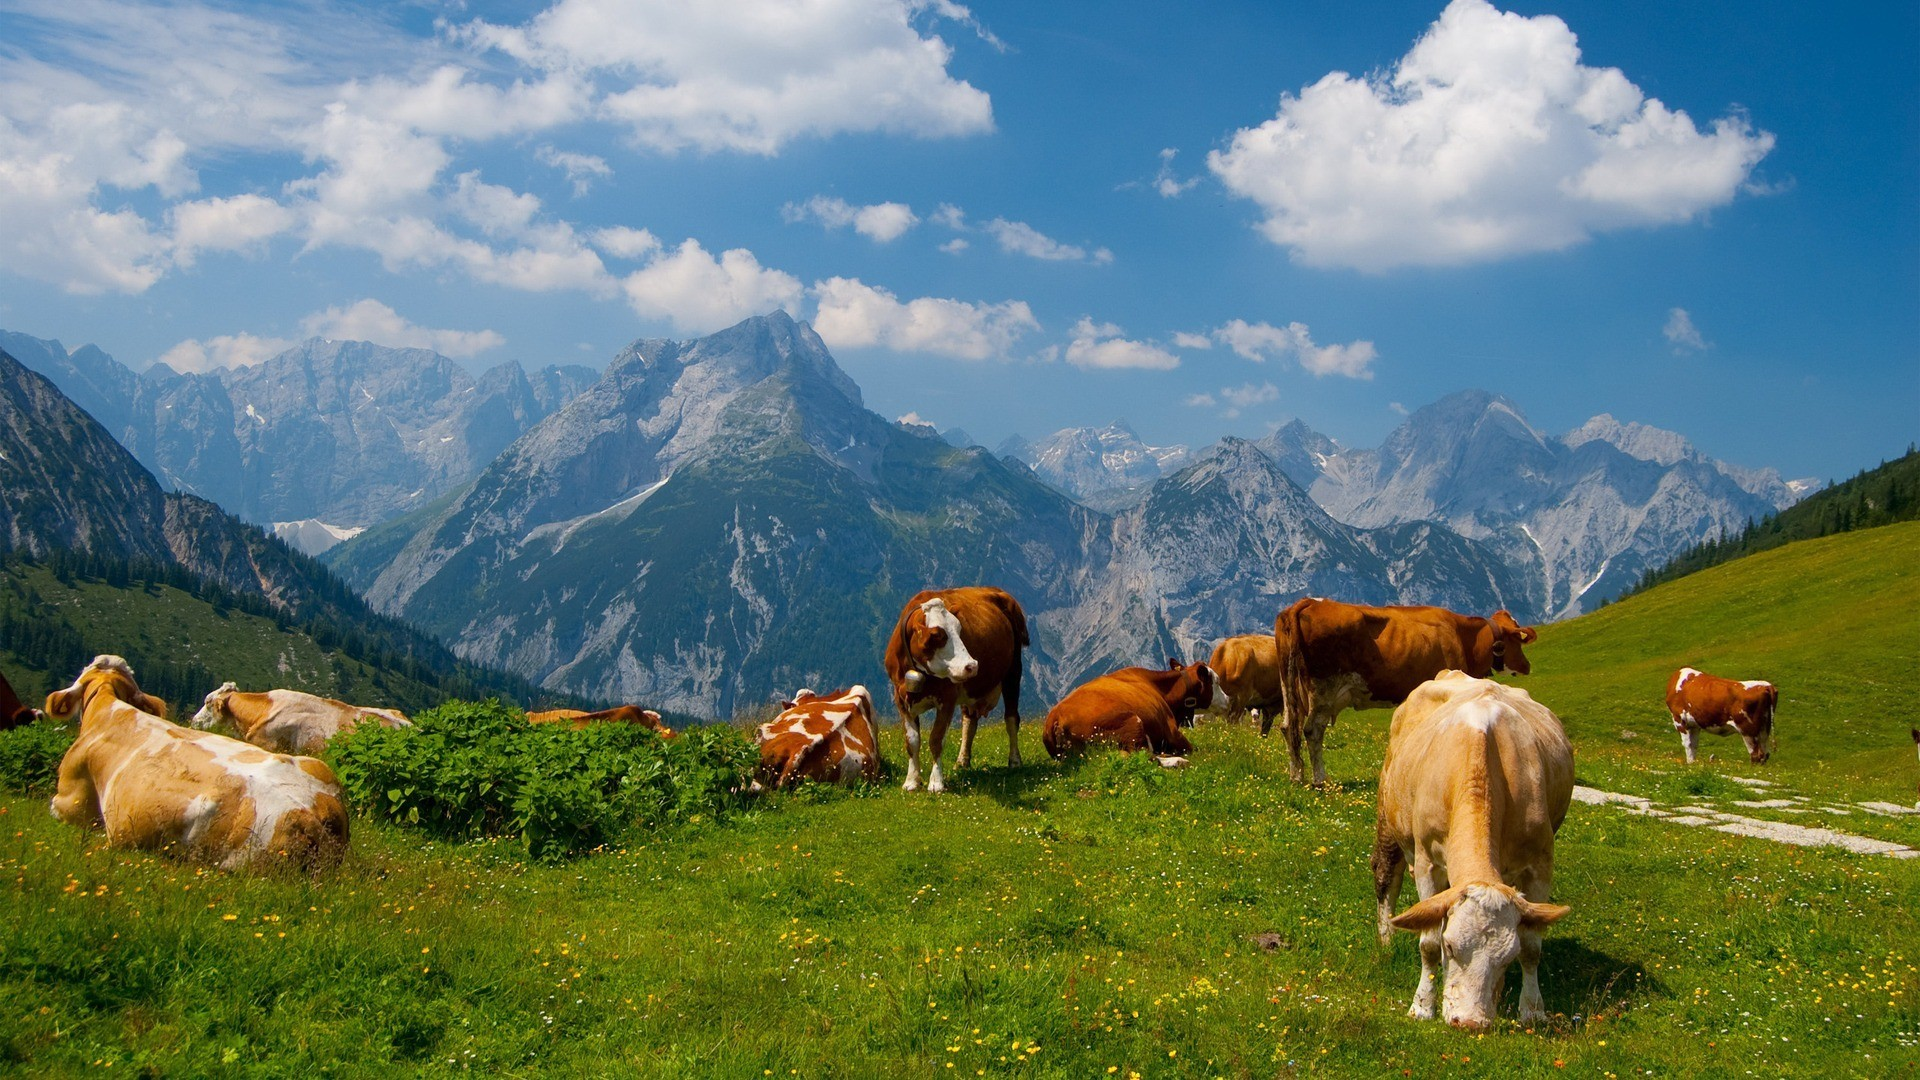 fantastic cattle wallpaper